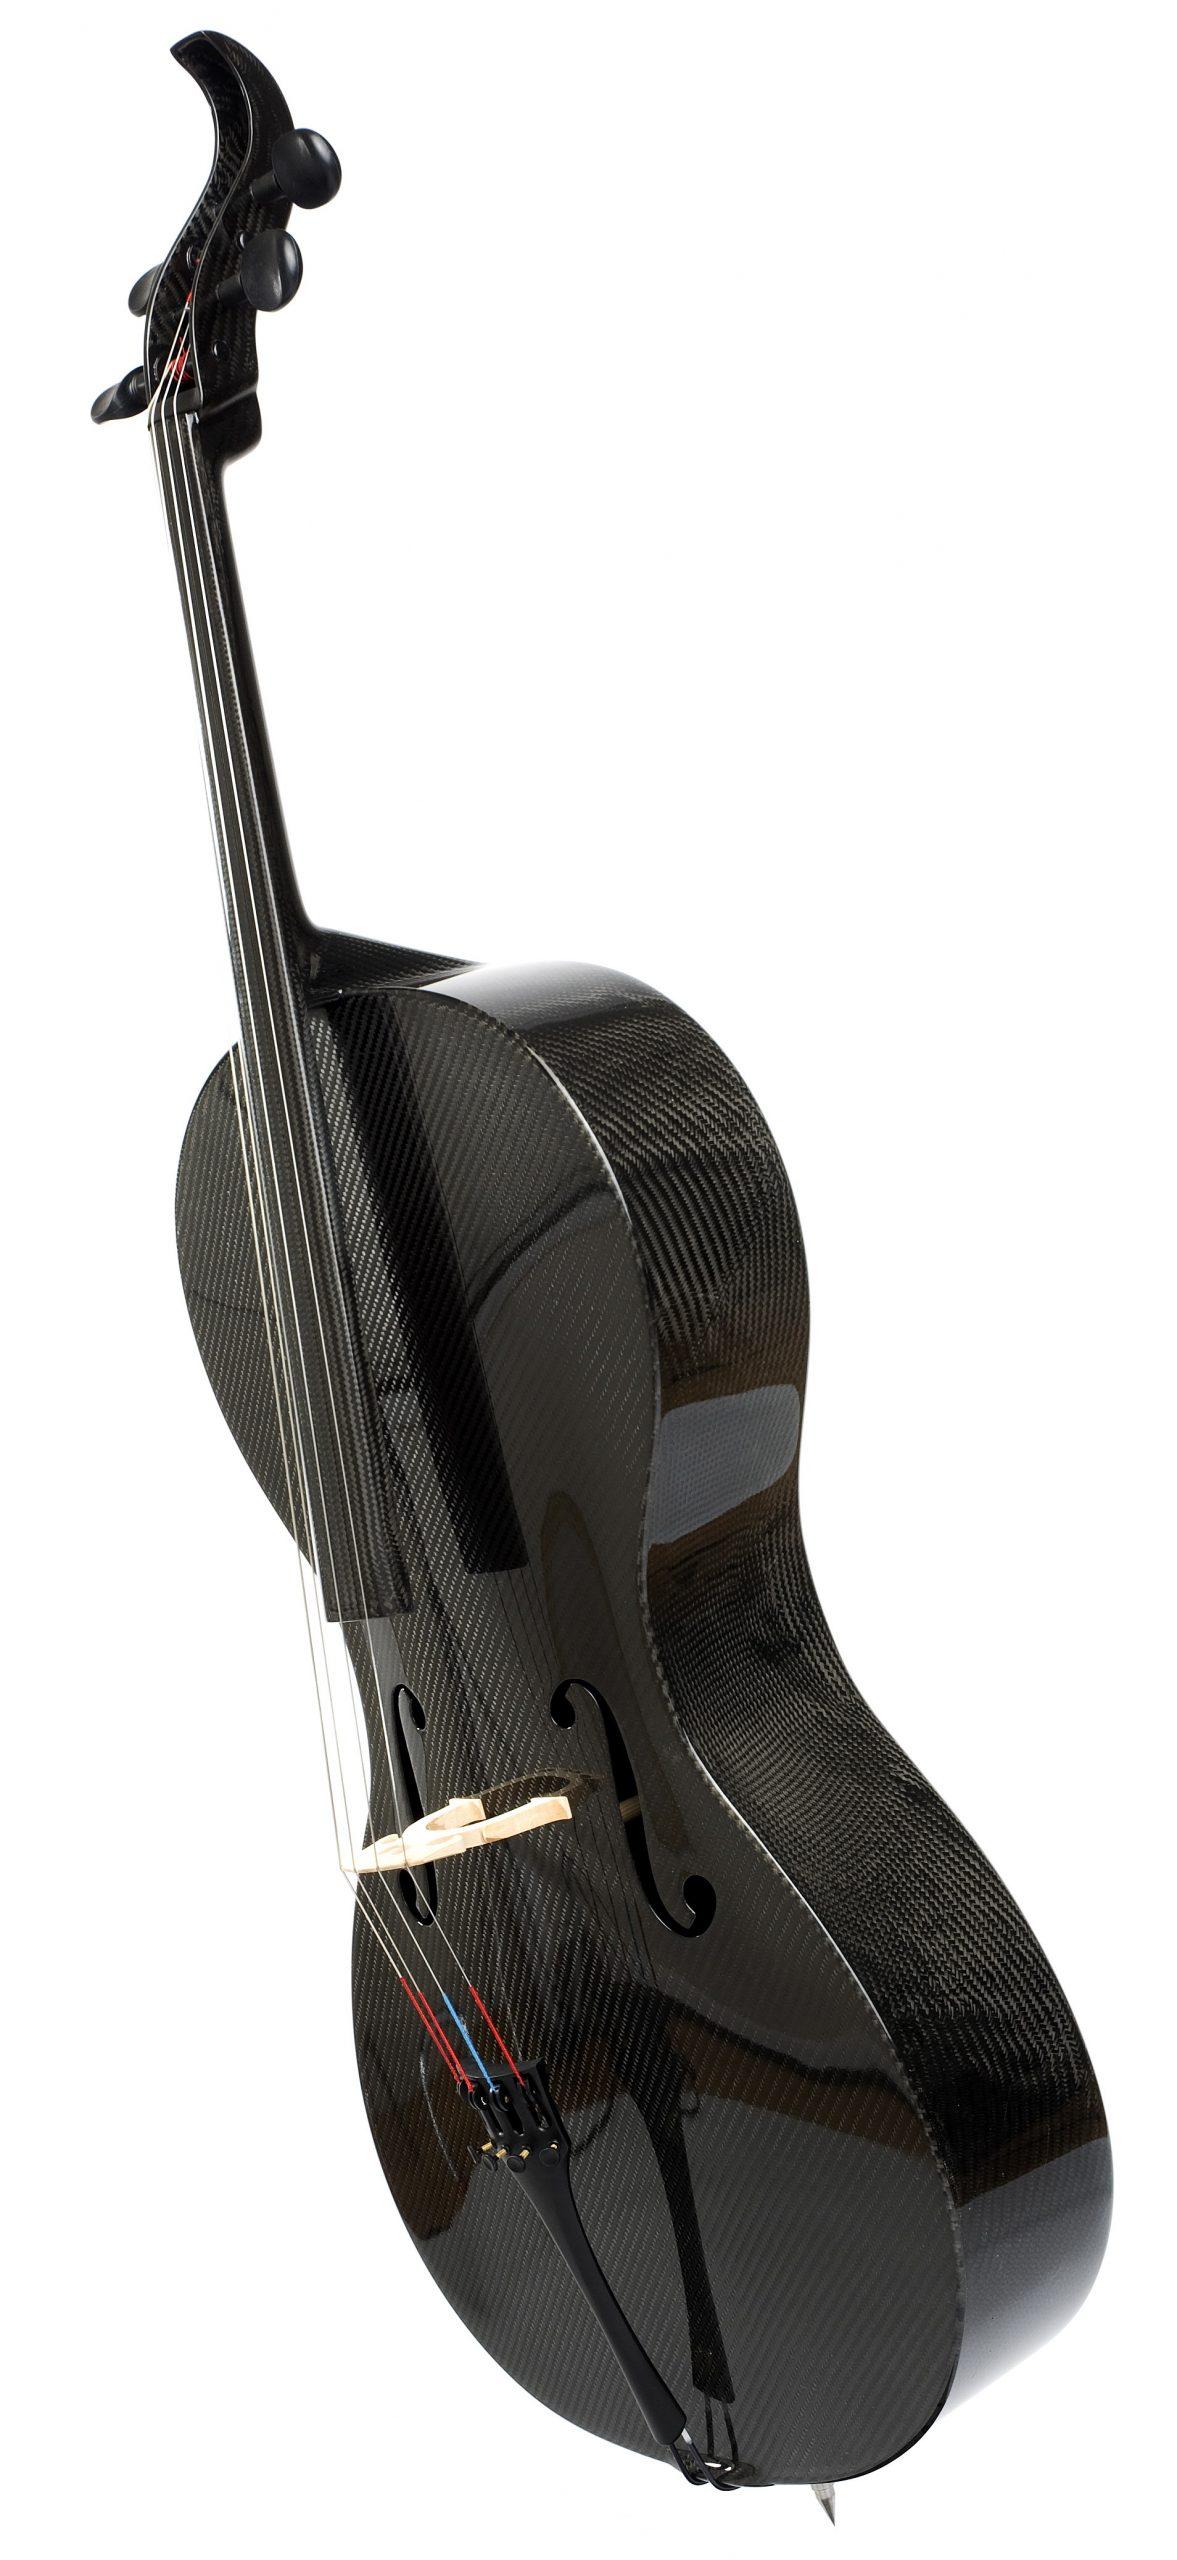 Luis and Clark Carbon Fiber Cello – Photo by Kevin Sprague